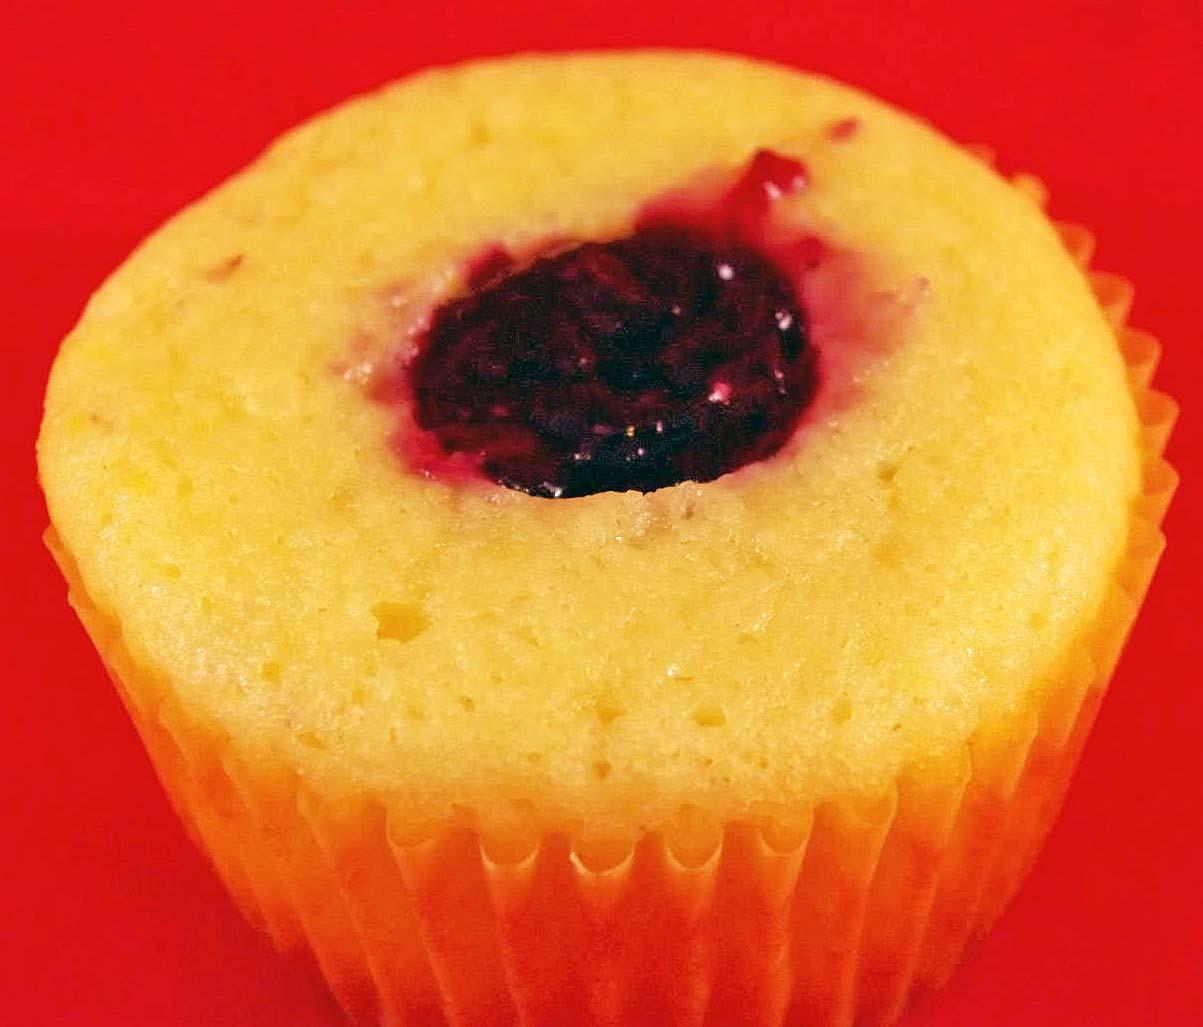 4 goodness bake!: lemon-blueberry cupcakes with whipped lemon